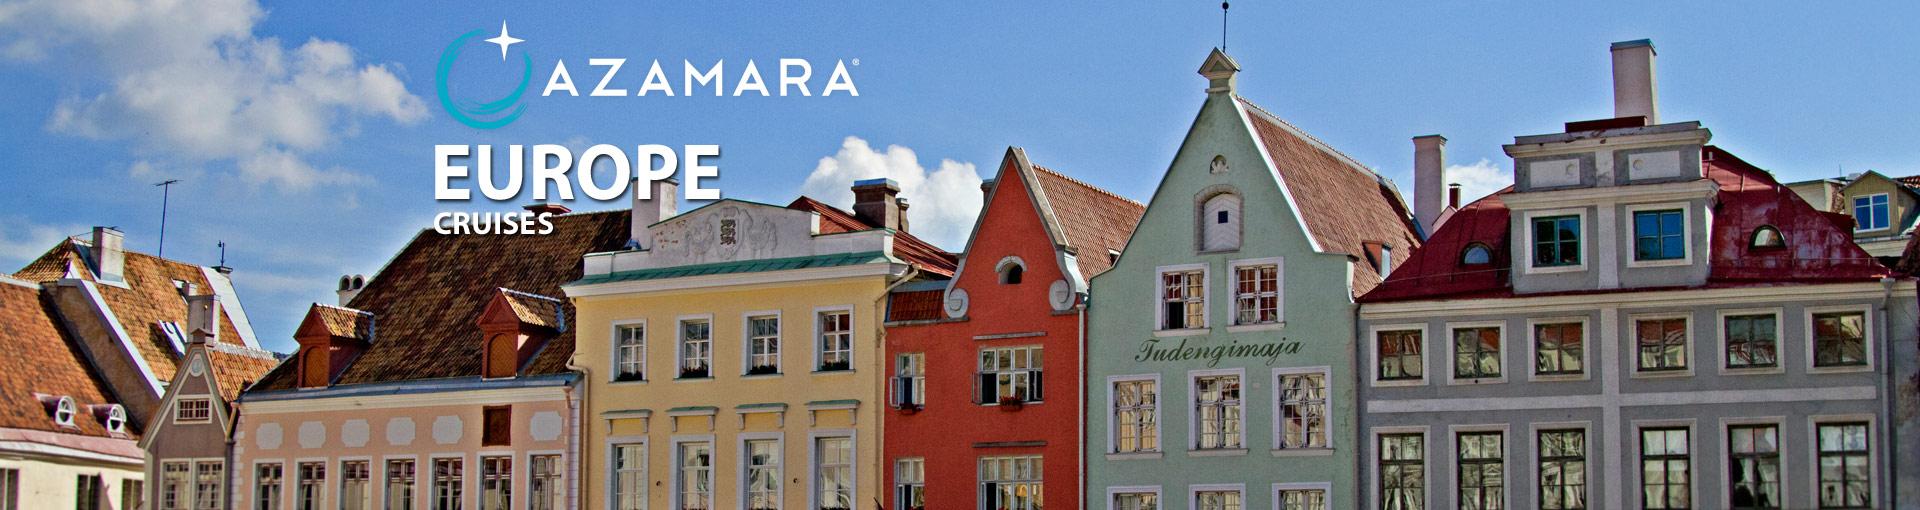 Azamara Club Cruises Europe Cruises